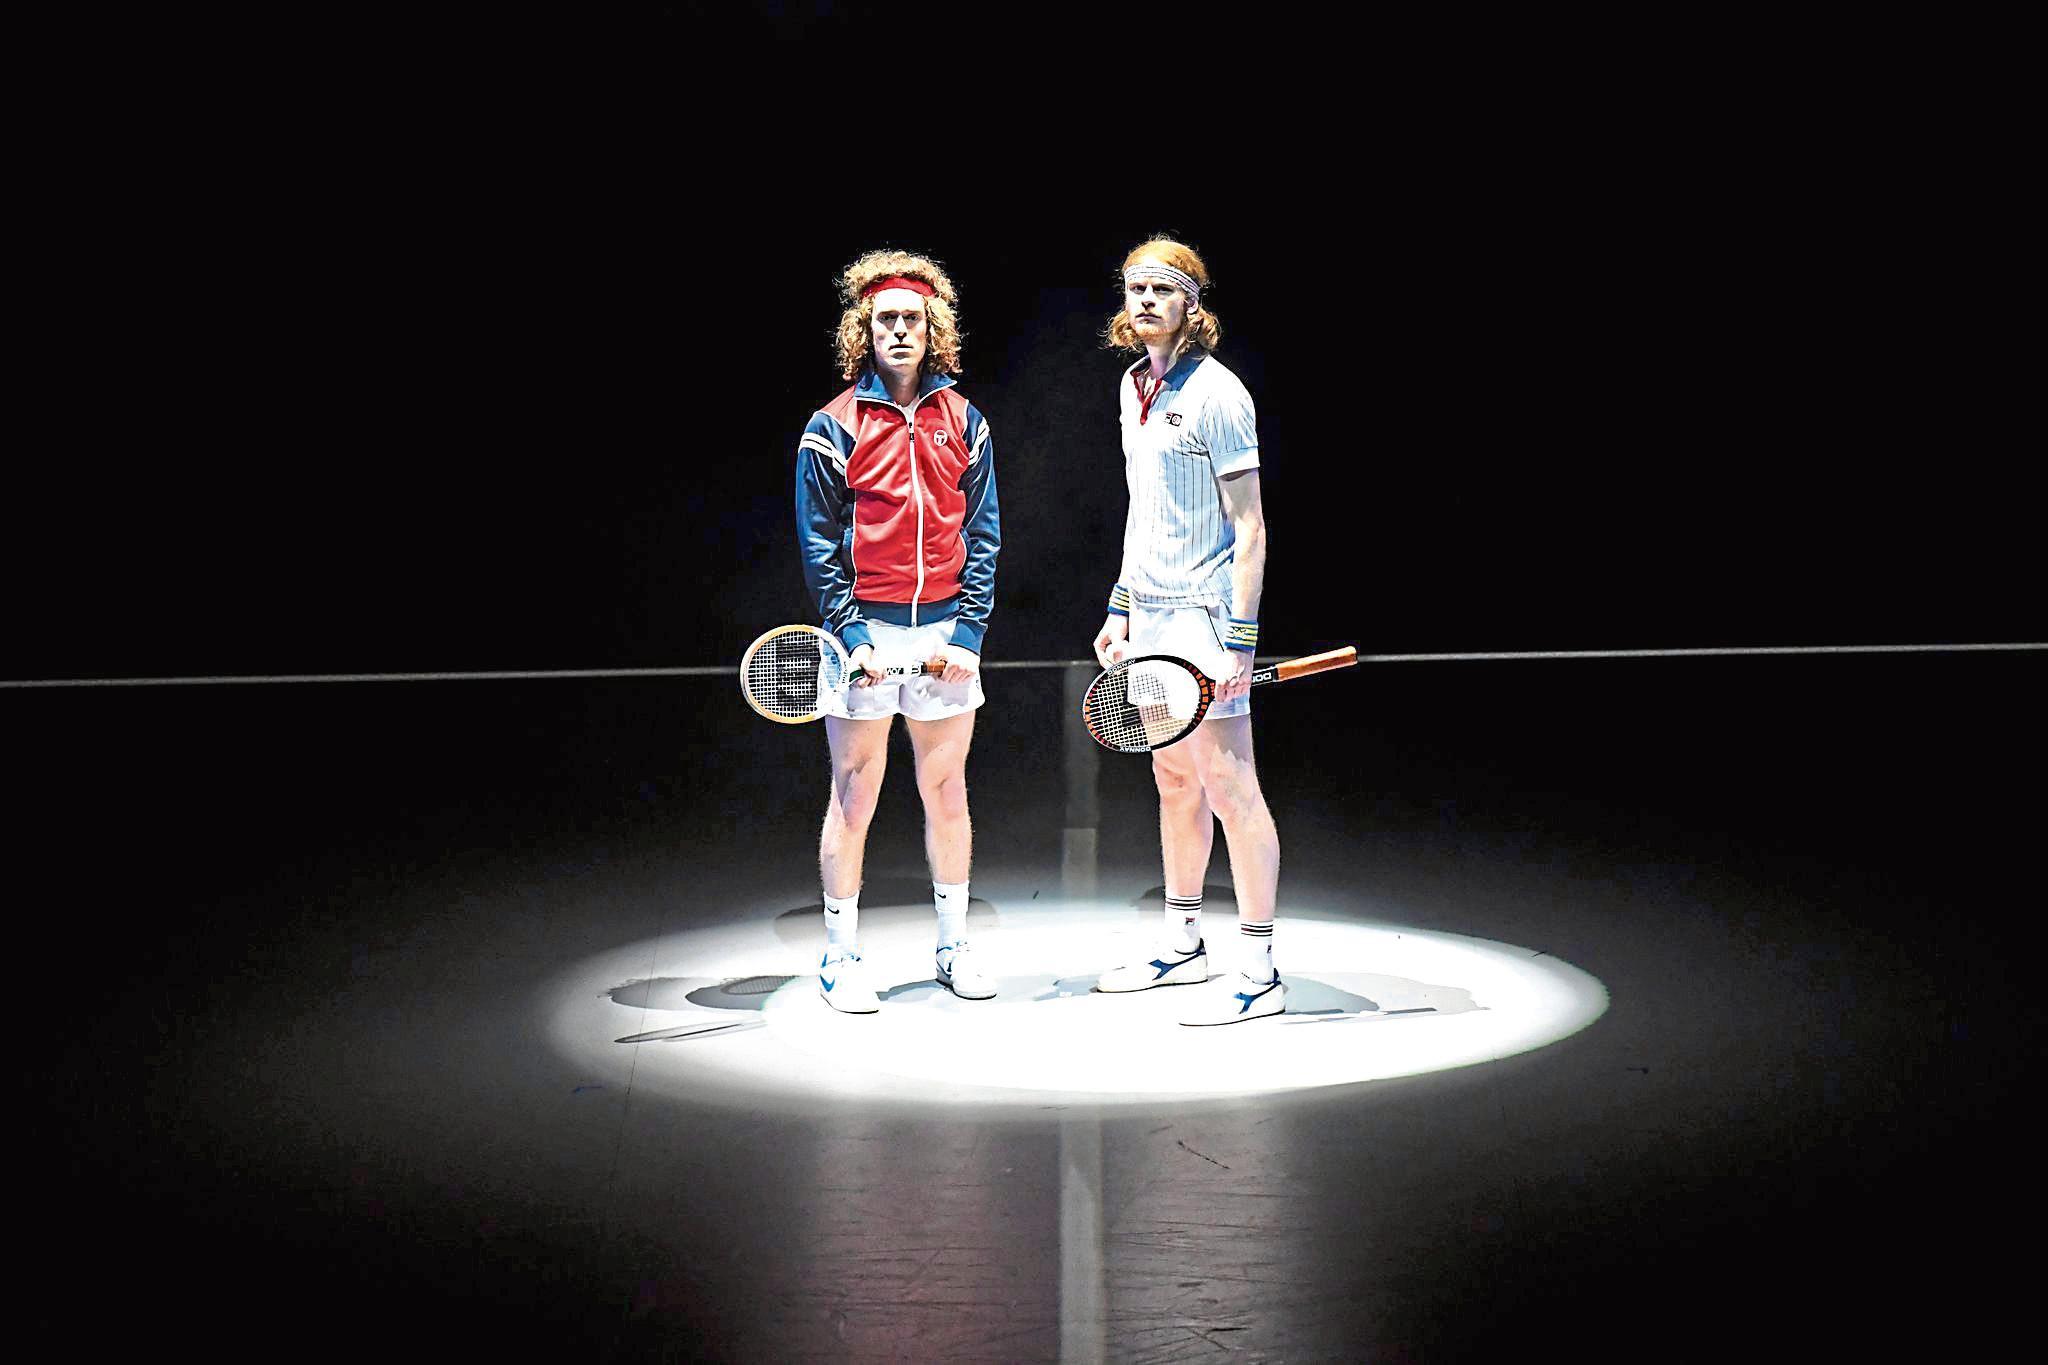 Signal2Noise helped recreate the legendary Wimbledon Final between Bjorn Borg and John McEnroe